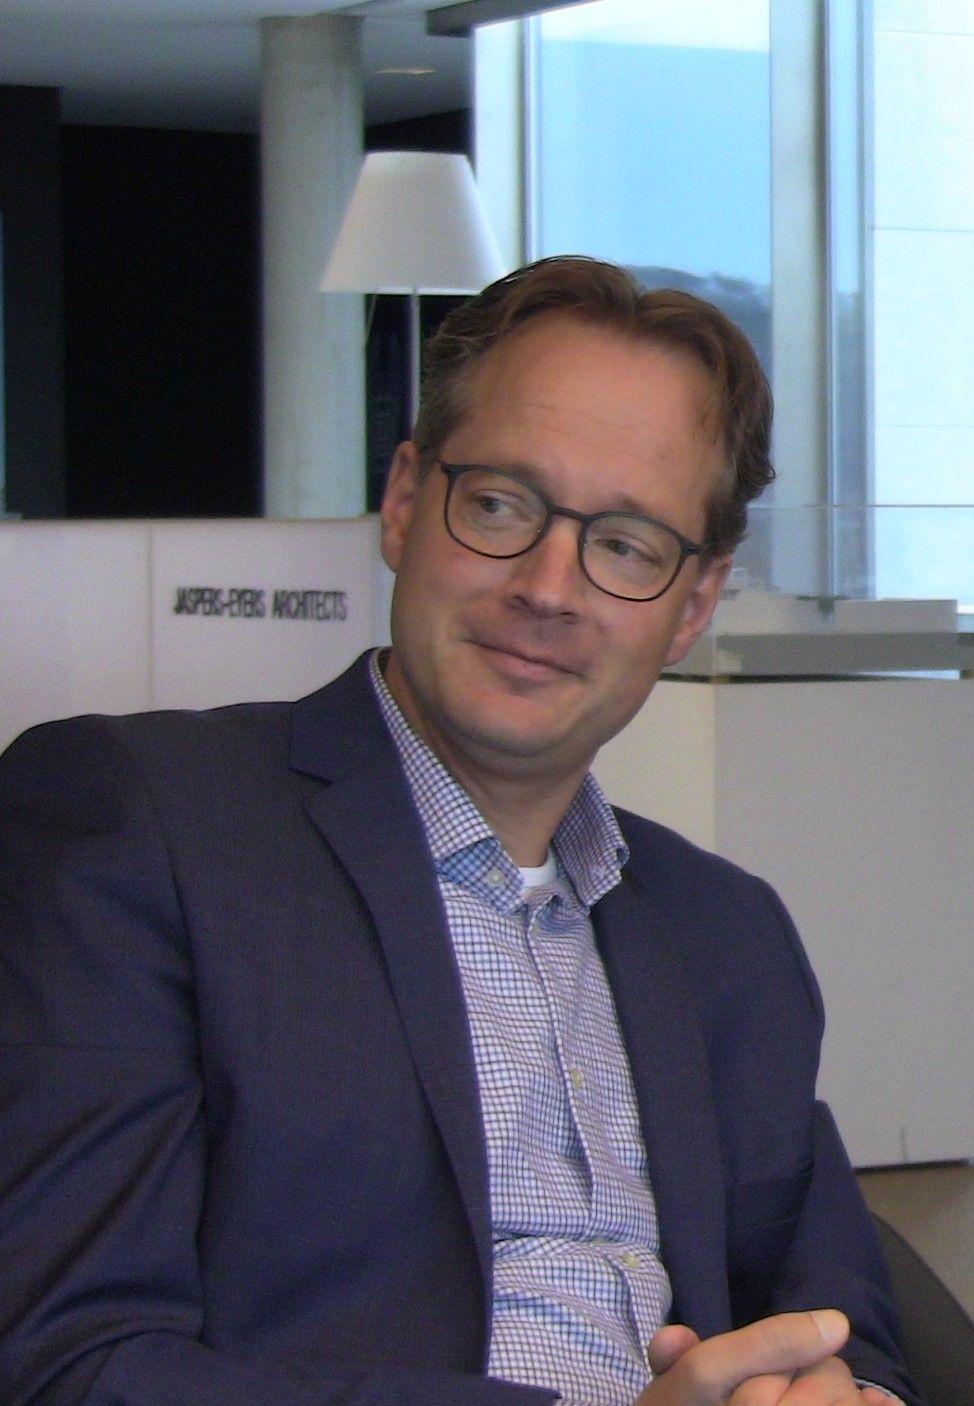 Kasper Oudshoorn